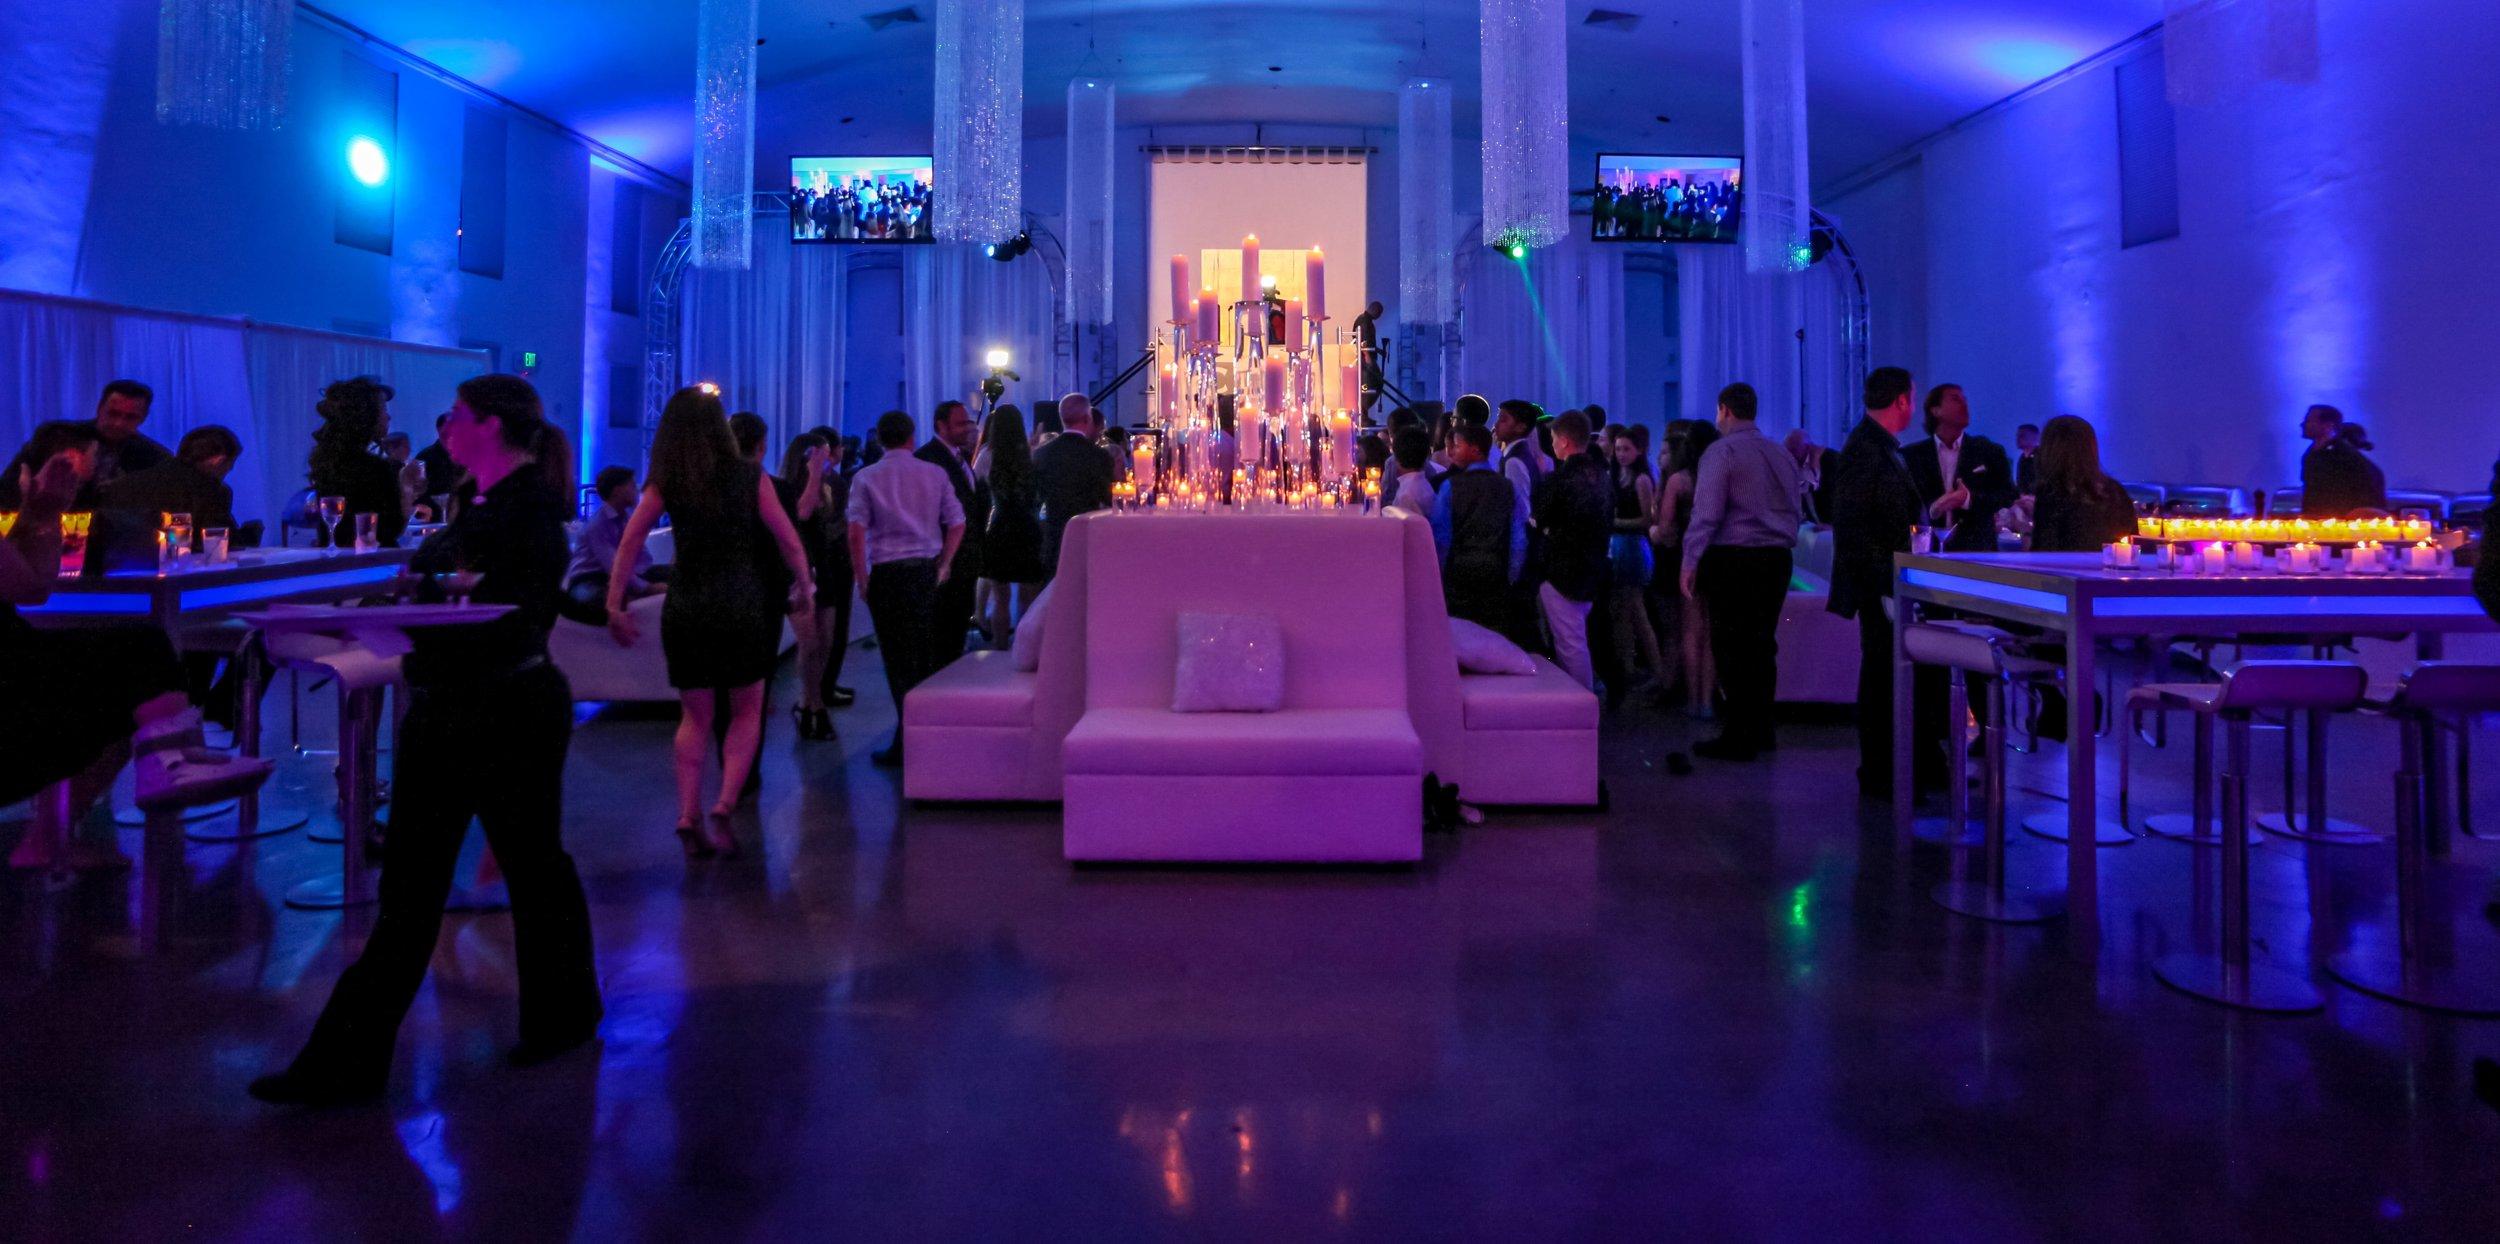 the_temple_house_events-13-min.jpg